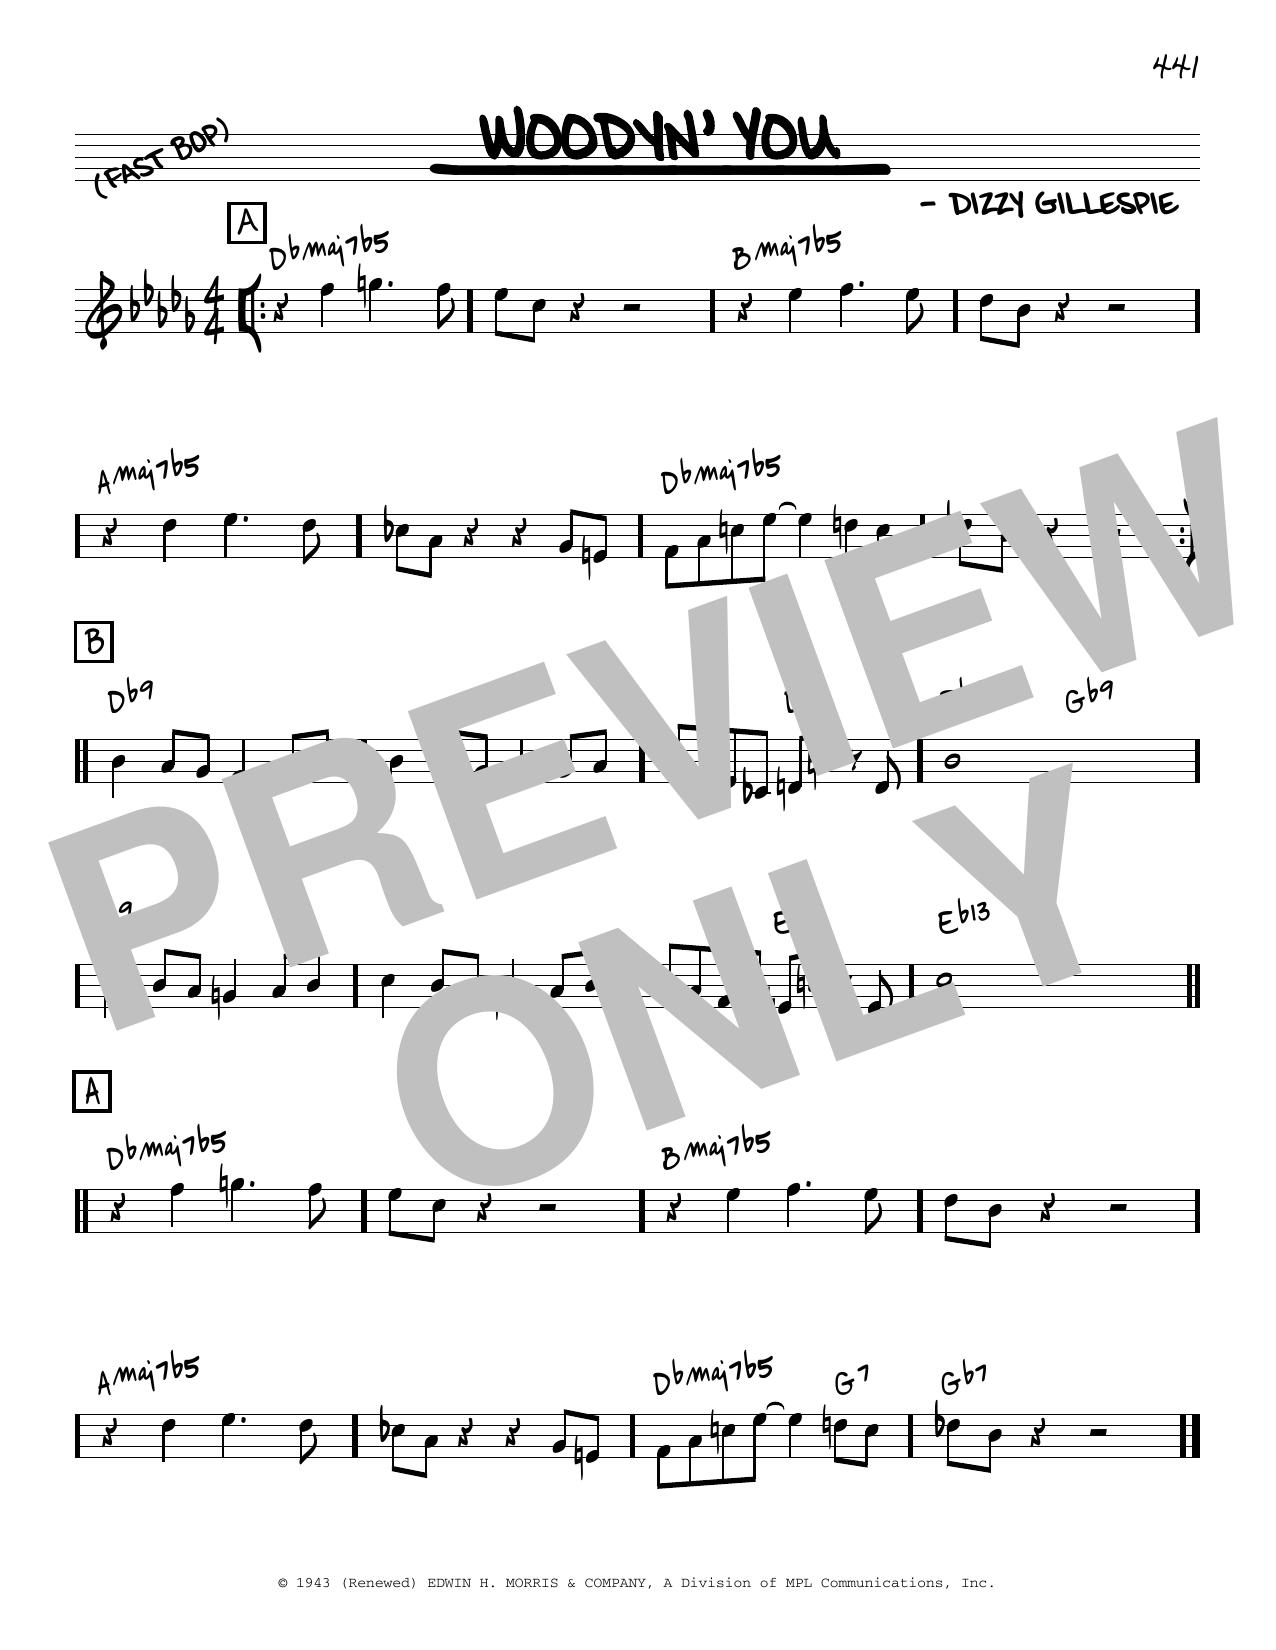 Dizzy Gillespie Woodyn' You [Reharmonized version] (arr. Jack Grassel) sheet music notes printable PDF score